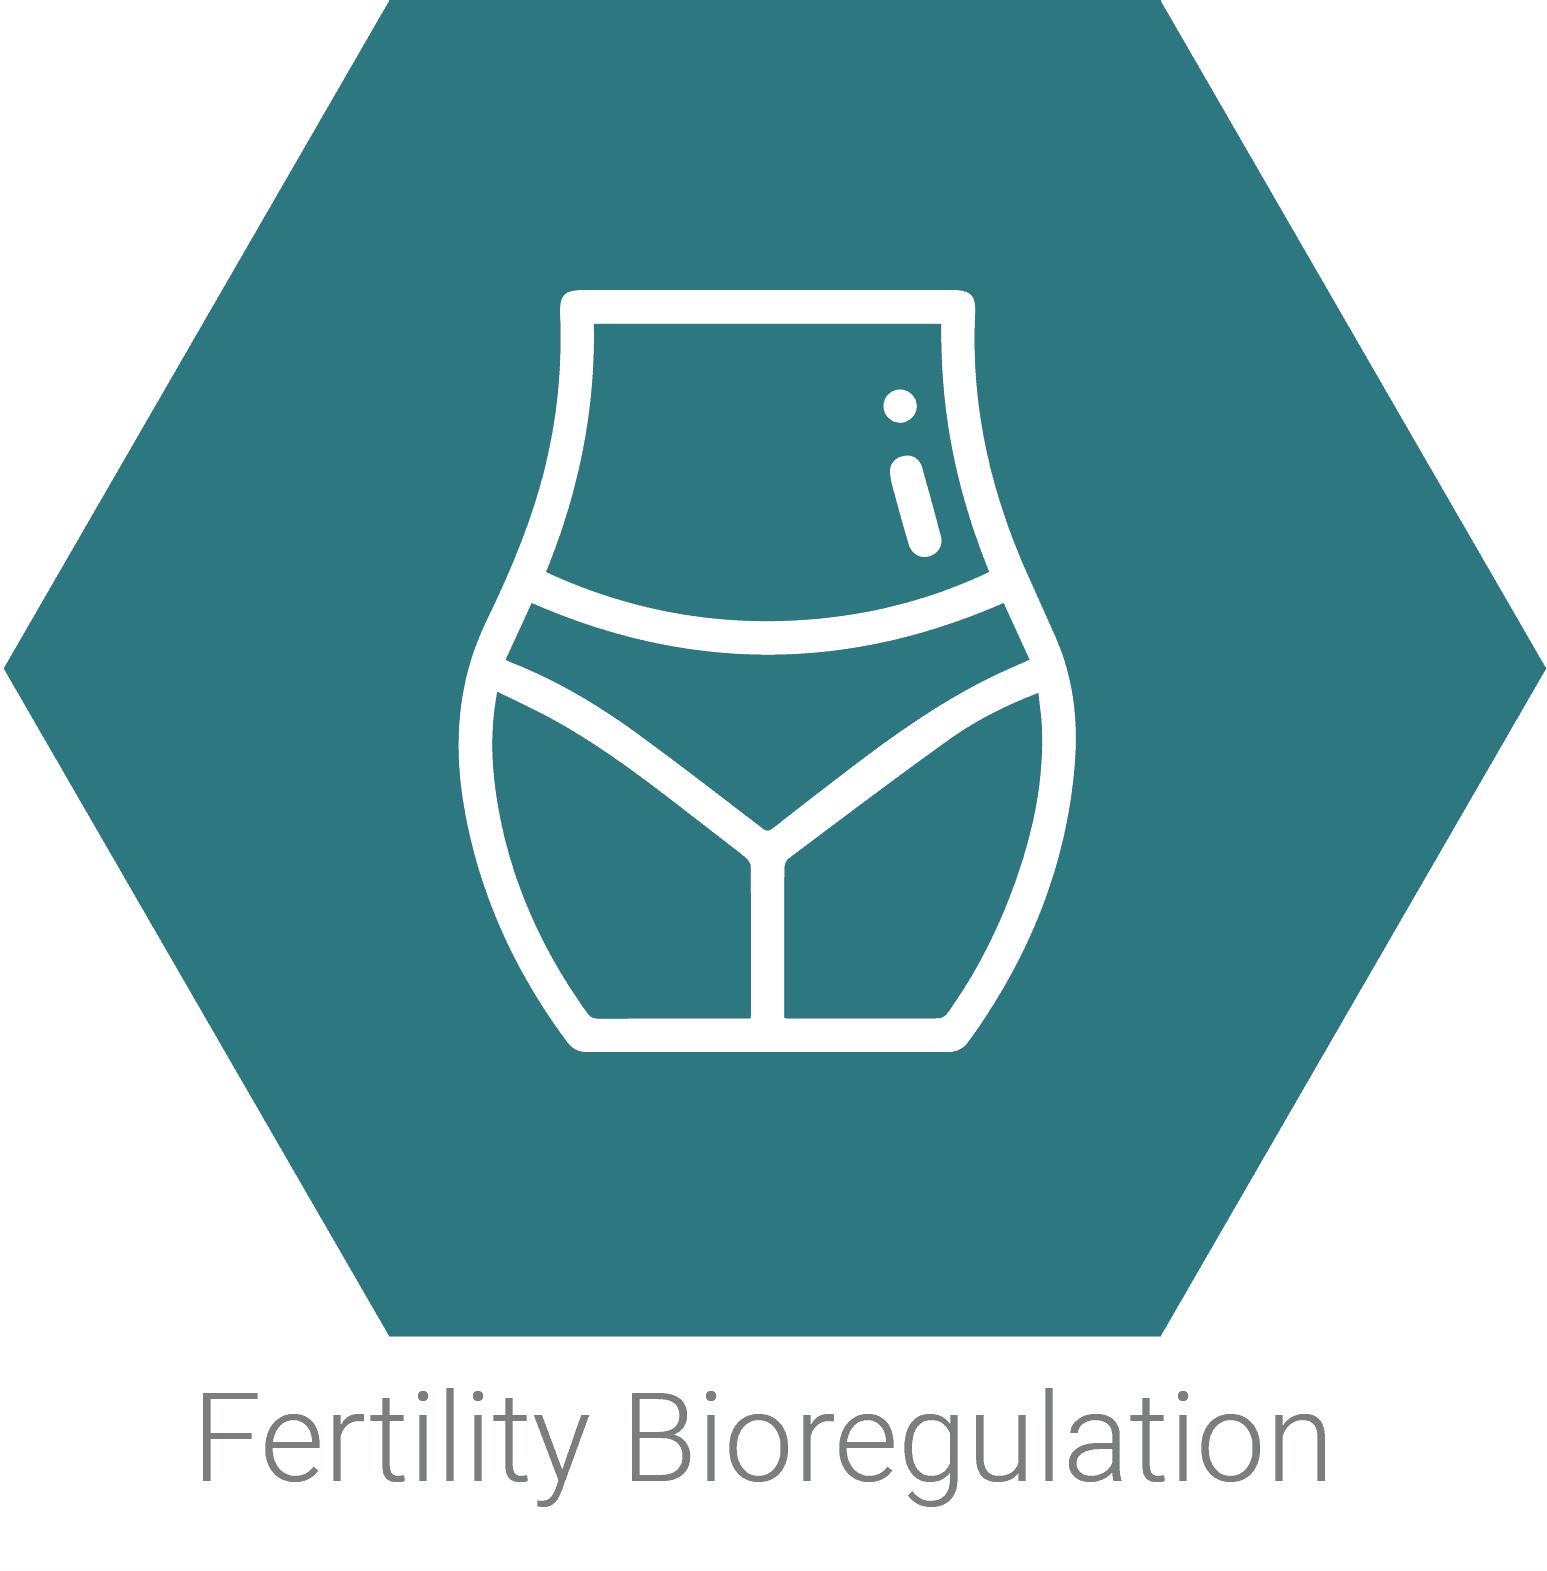 Fertility Bioregulation